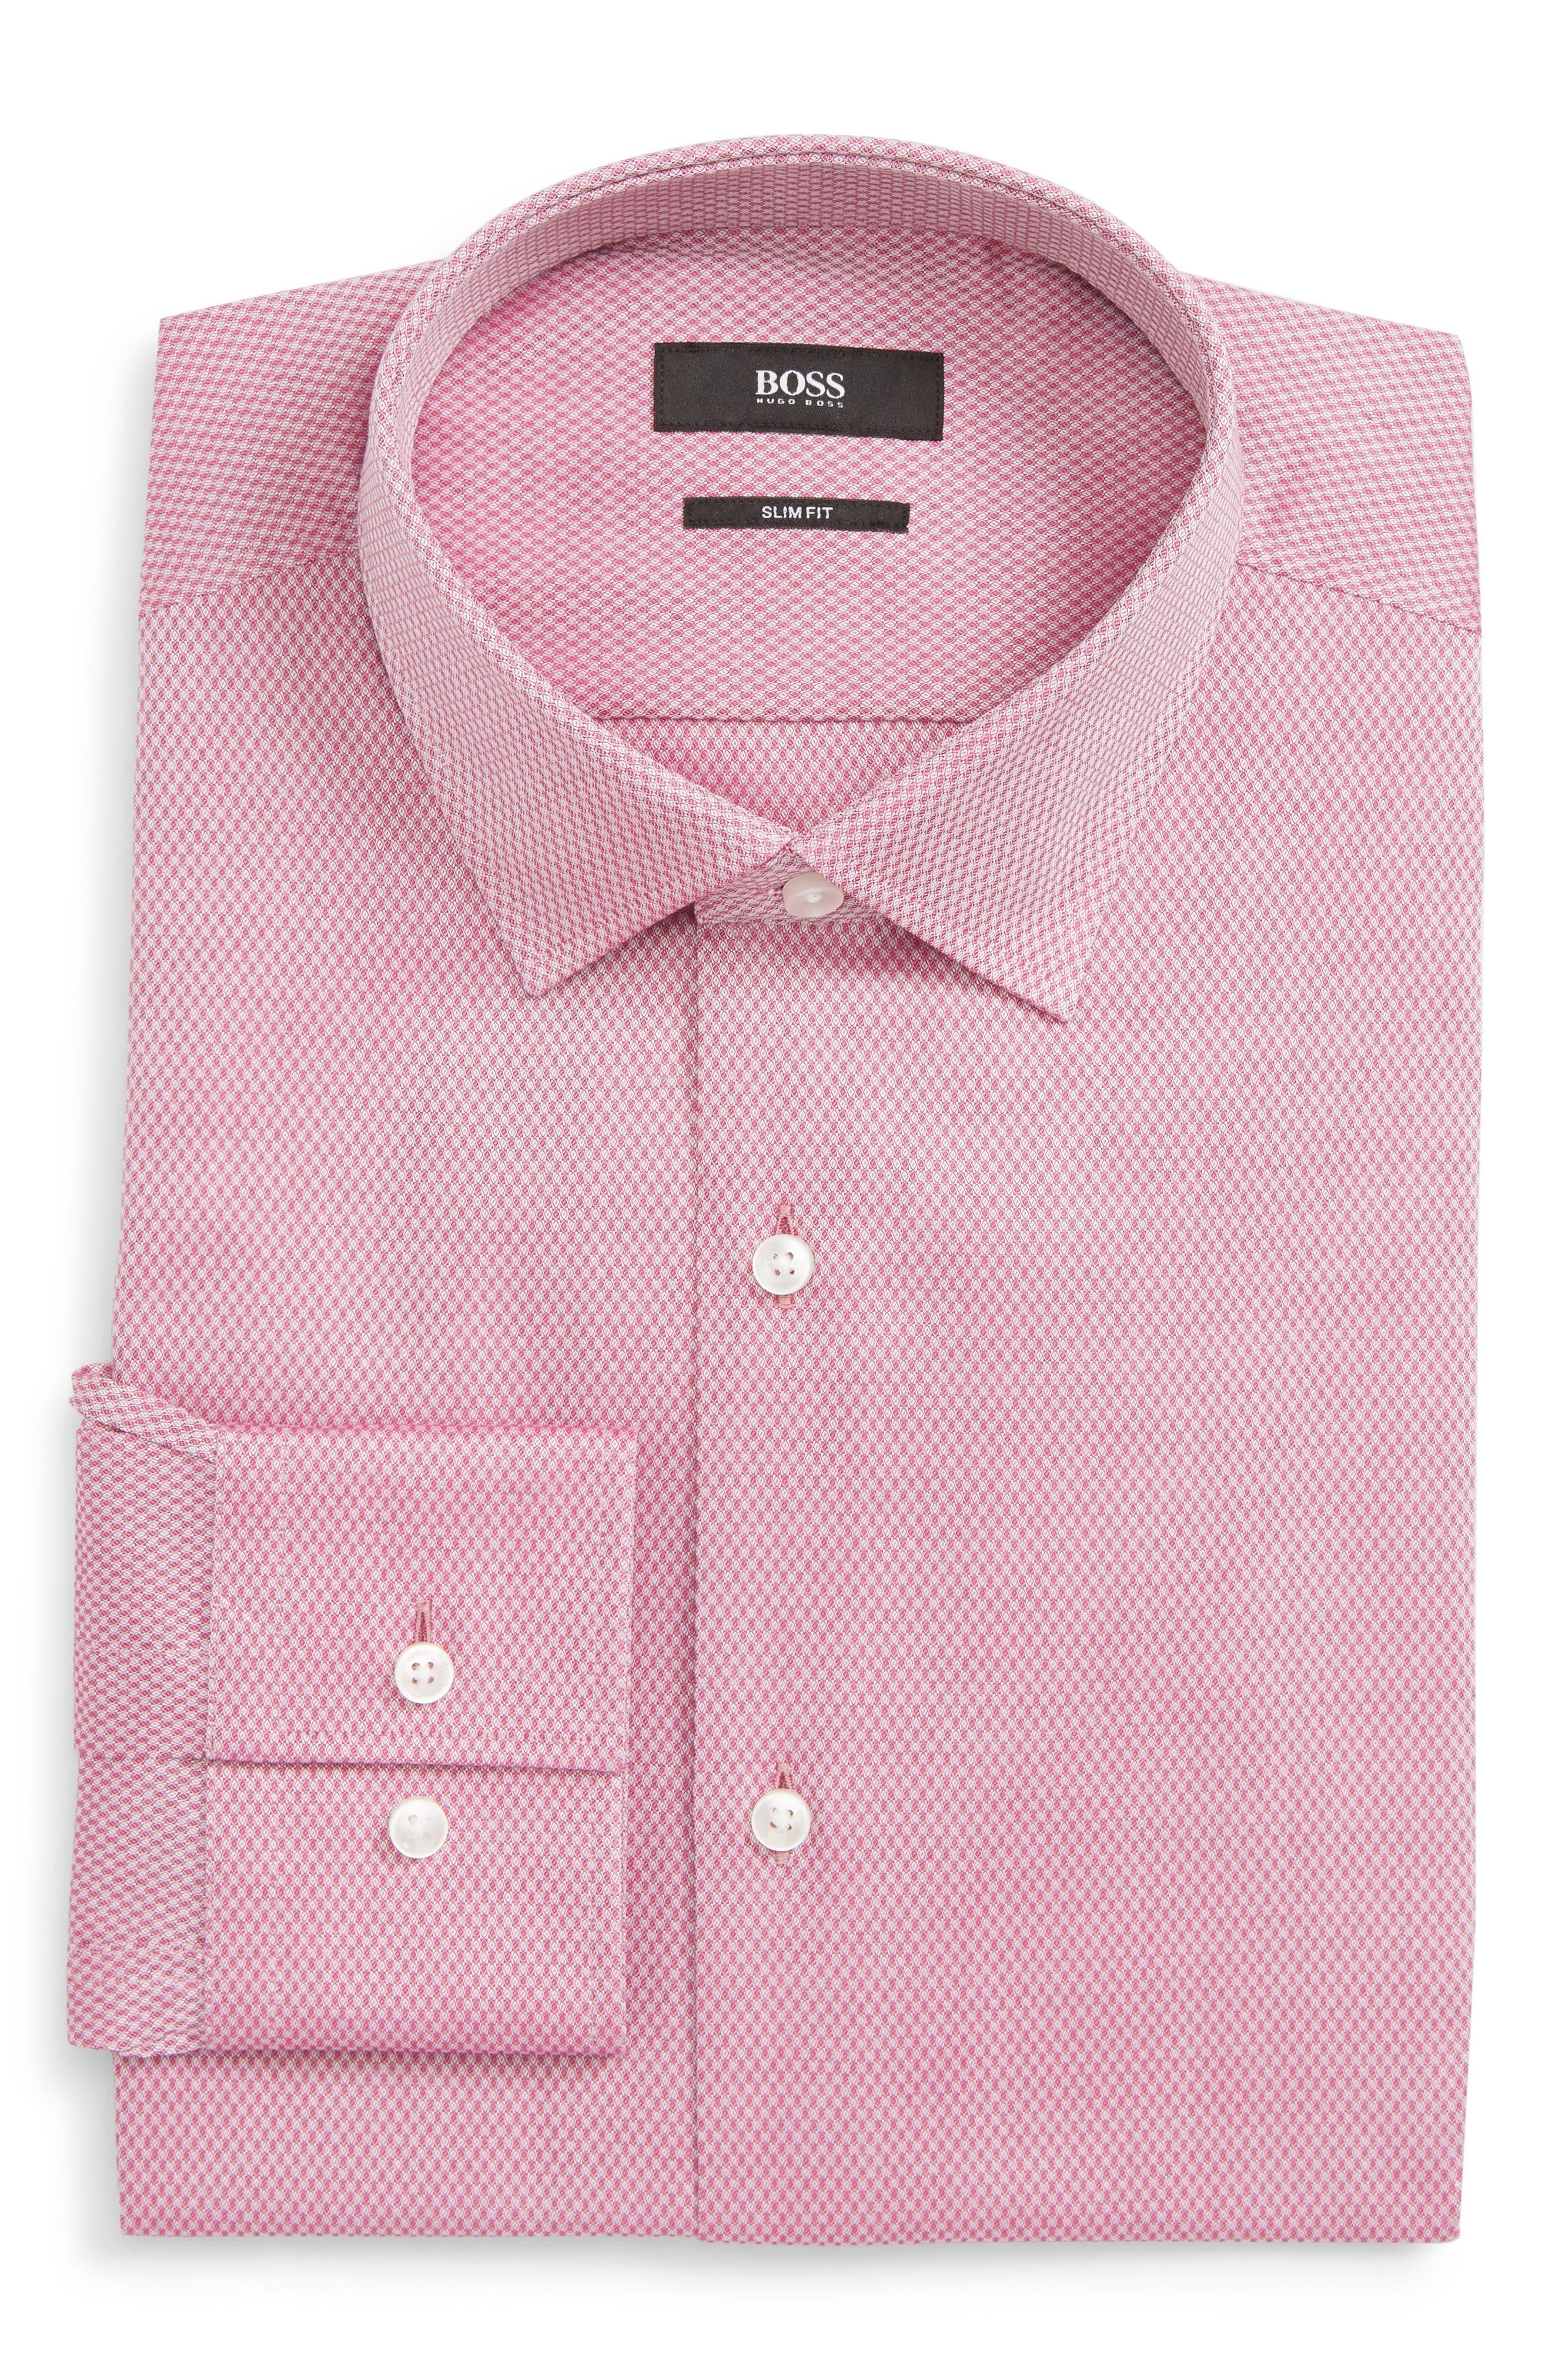 Jenno Slim Fit Solid Dress Shirt,                         Main,                         color, PINK